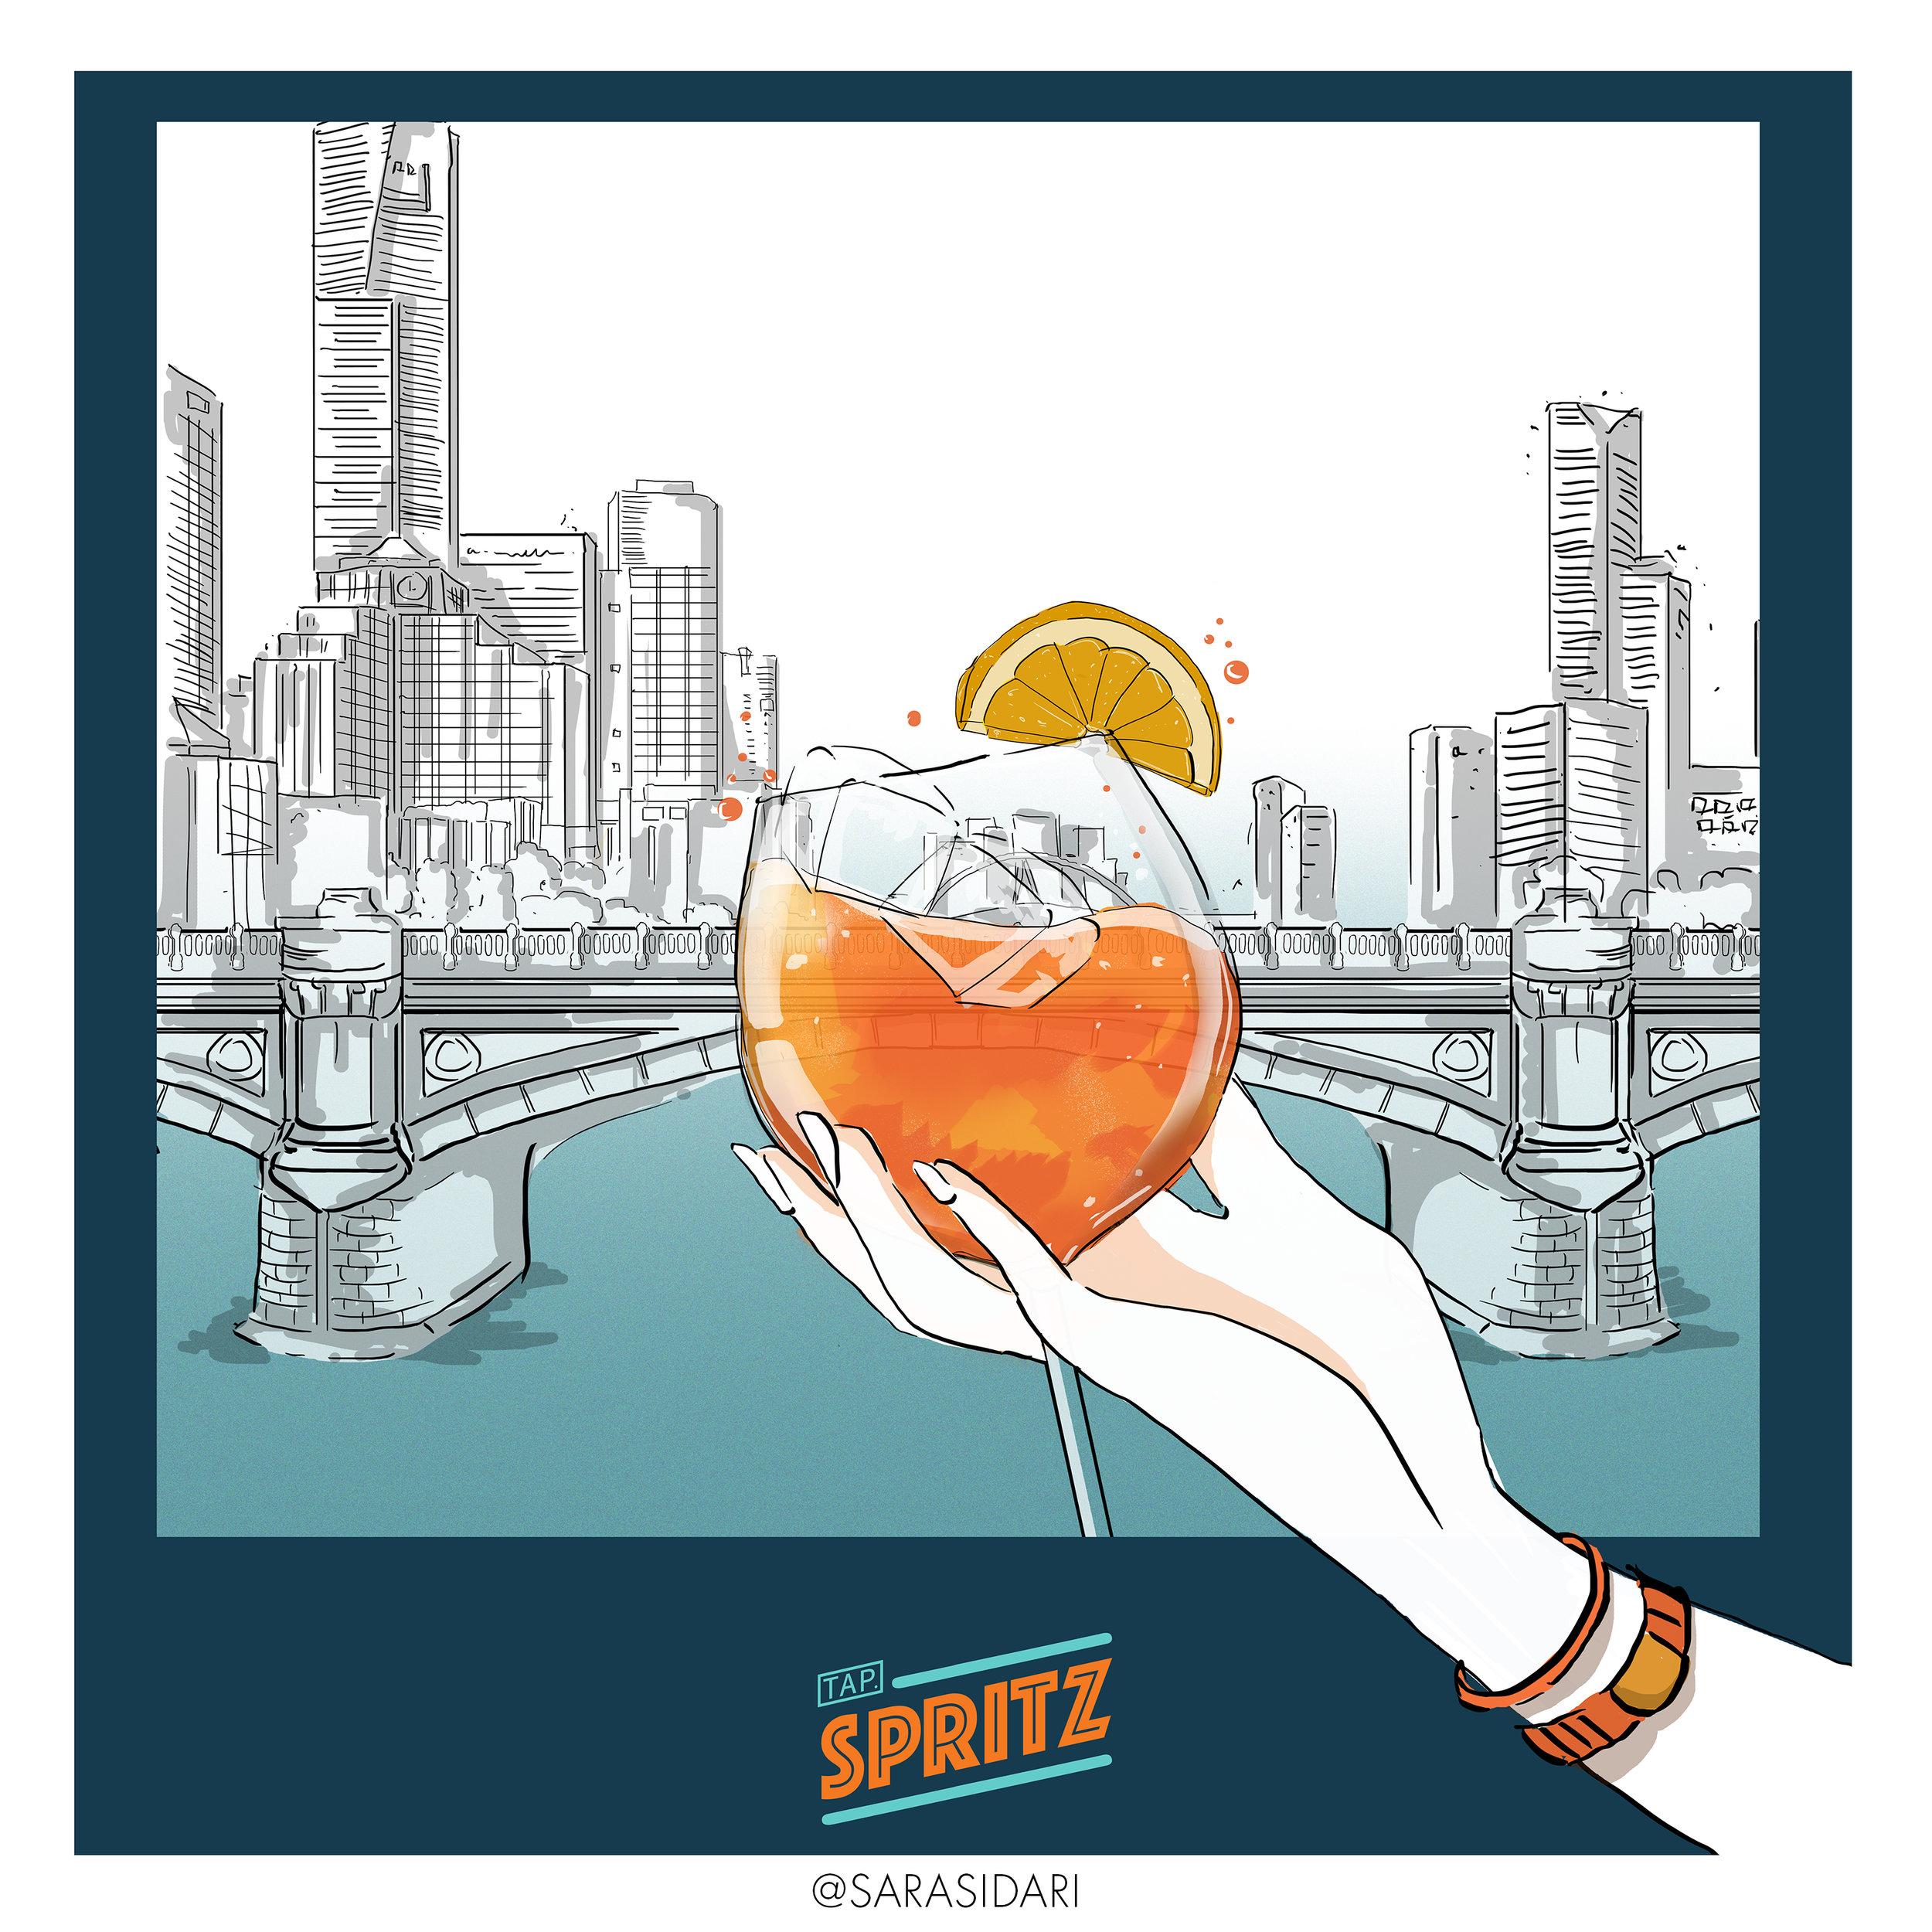 spritz tap branding illustrations02.jpg